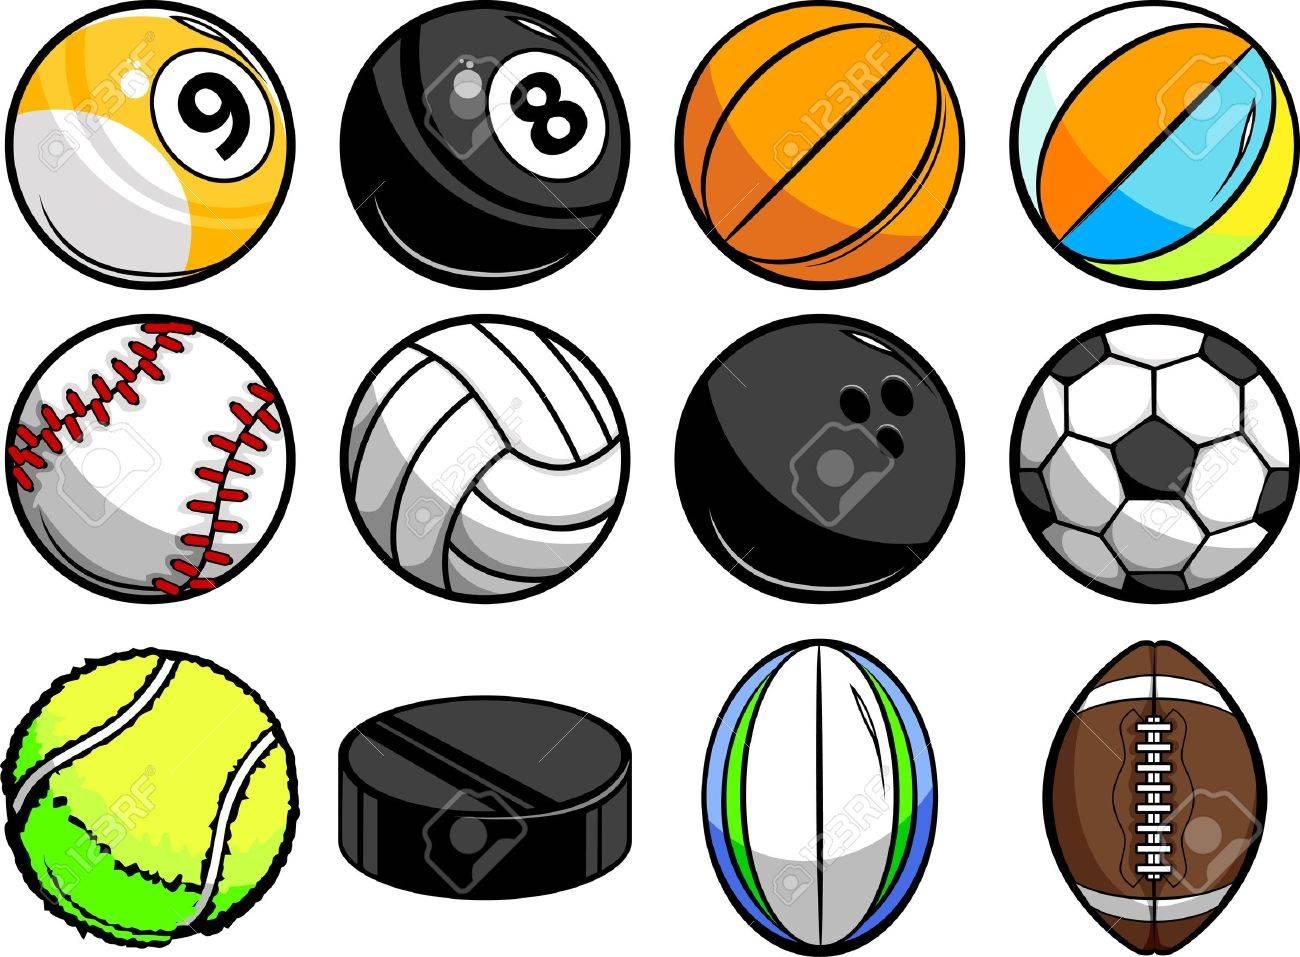 Vector Illustrations of Sport Balls - Baseball, Basketball, tennis, rugby and Billiards Stock Vector - 15209012